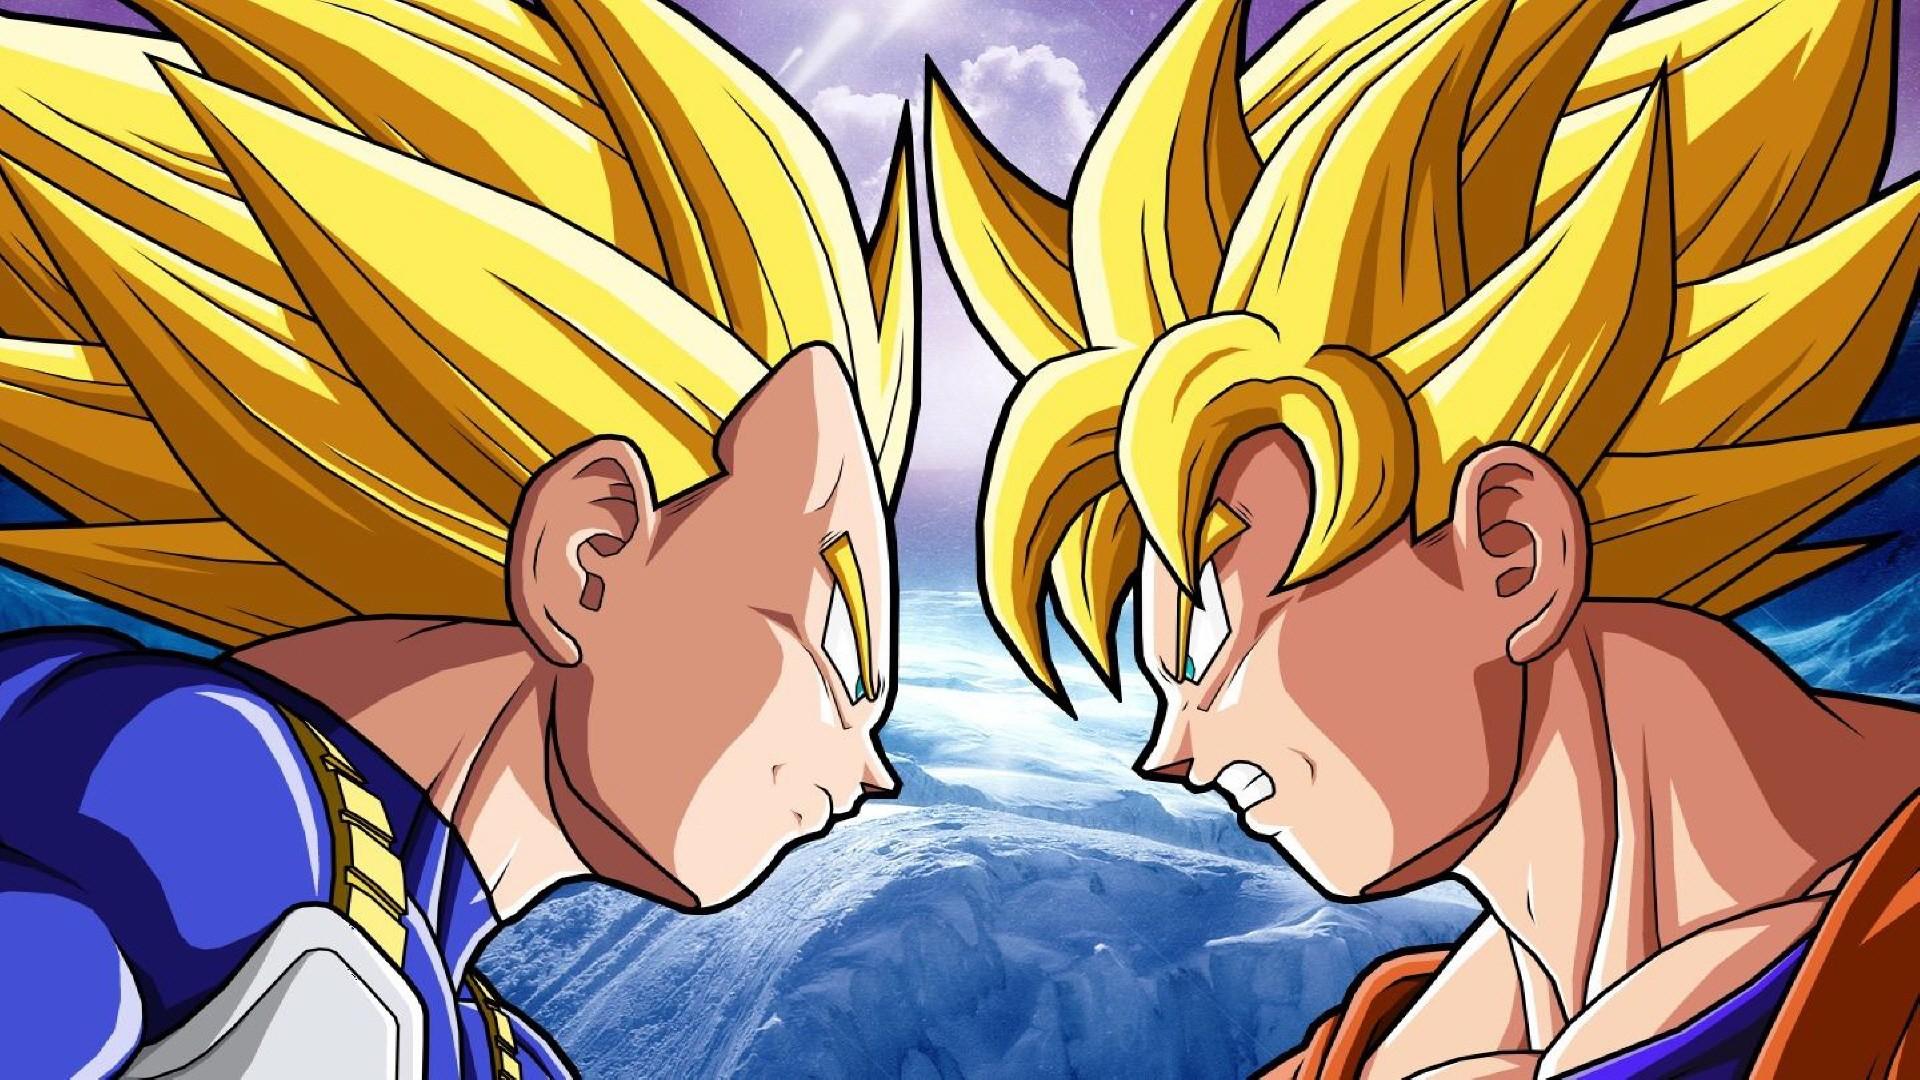 Dragon Ball Z Wallpaper HD Wallpapers, Backgrounds, Images, Art ..